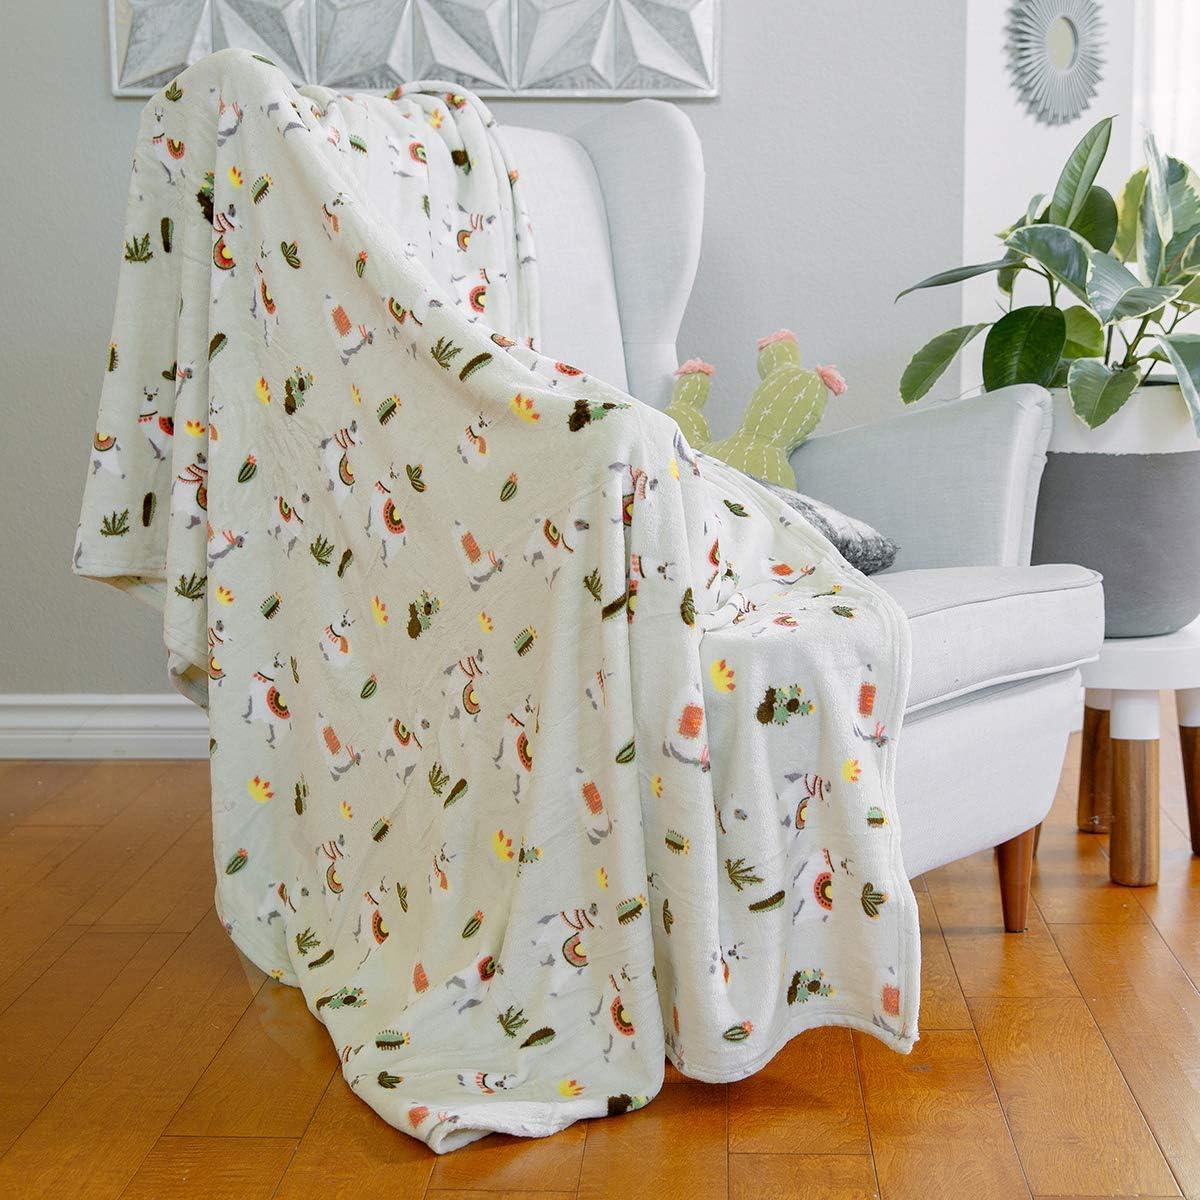 AVAFORT Velvet Plush Home Fleece Throw Blanket for Couch Sofa Bed,Warm Elegant Fuzzy Flannel Blanket for Kid Baby Adults or Pet,Lightweight Soft Cozy Warm Luxury Microfiber Blankets(Llama-Desert Sand)